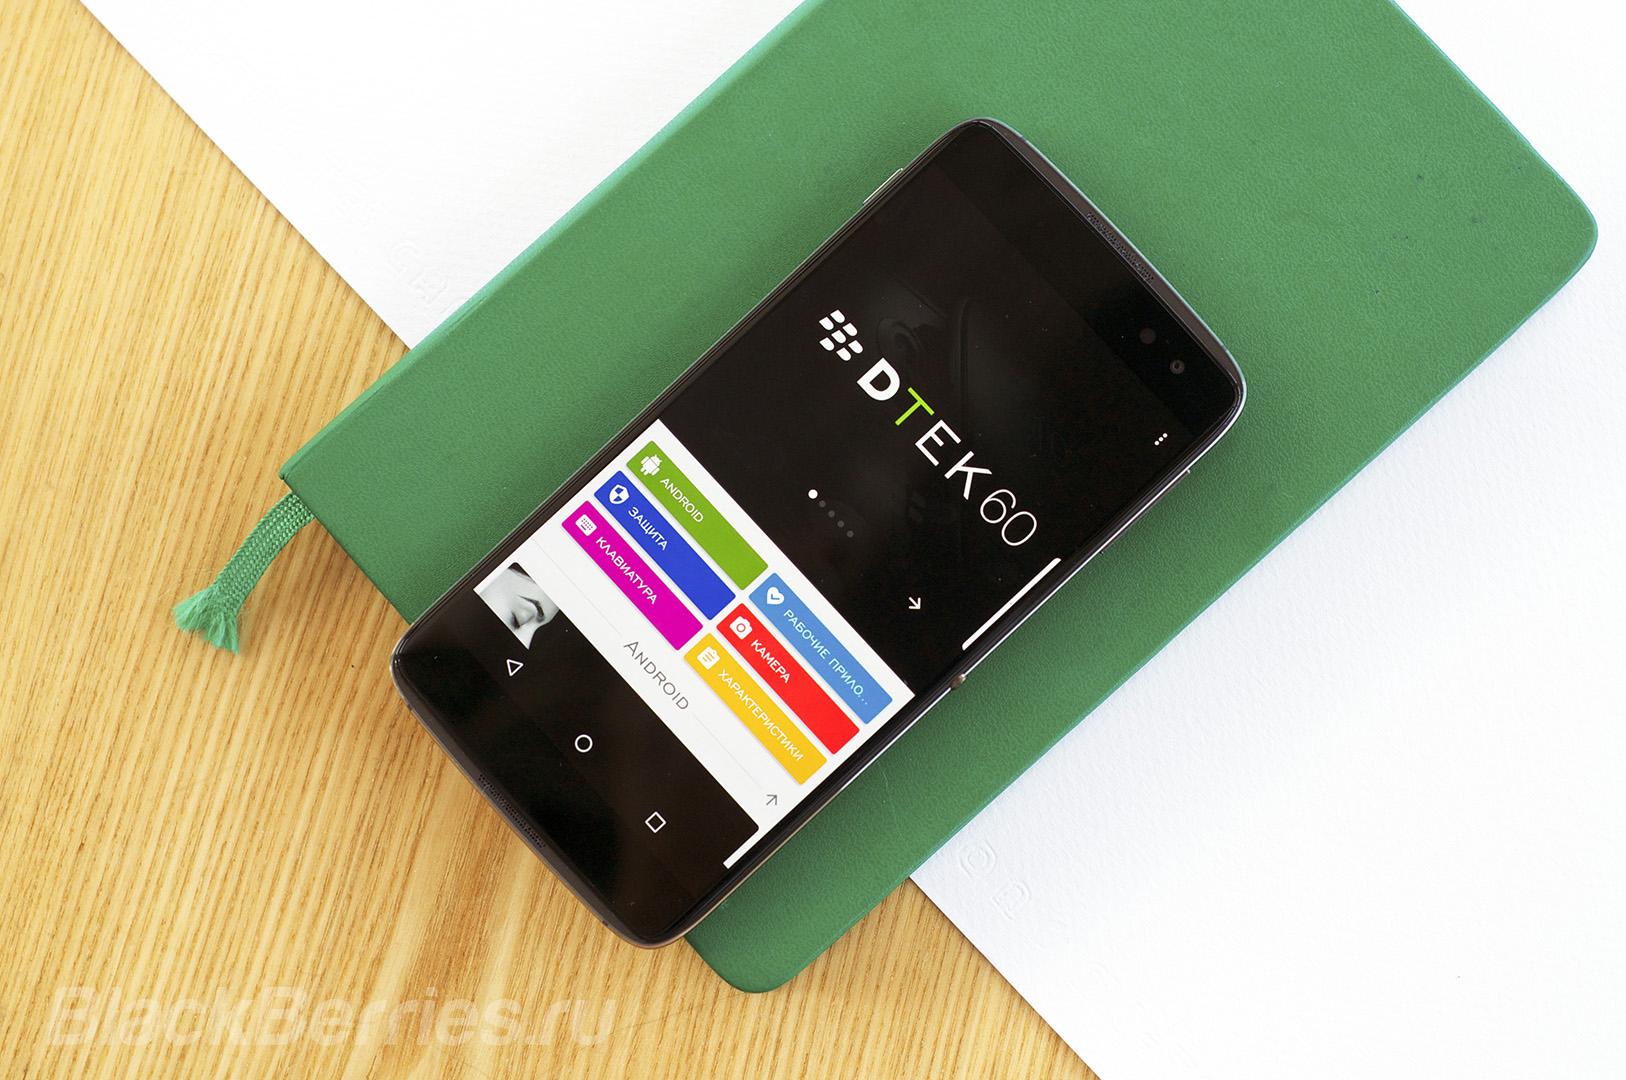 blackberry-dtek60-review-2-13